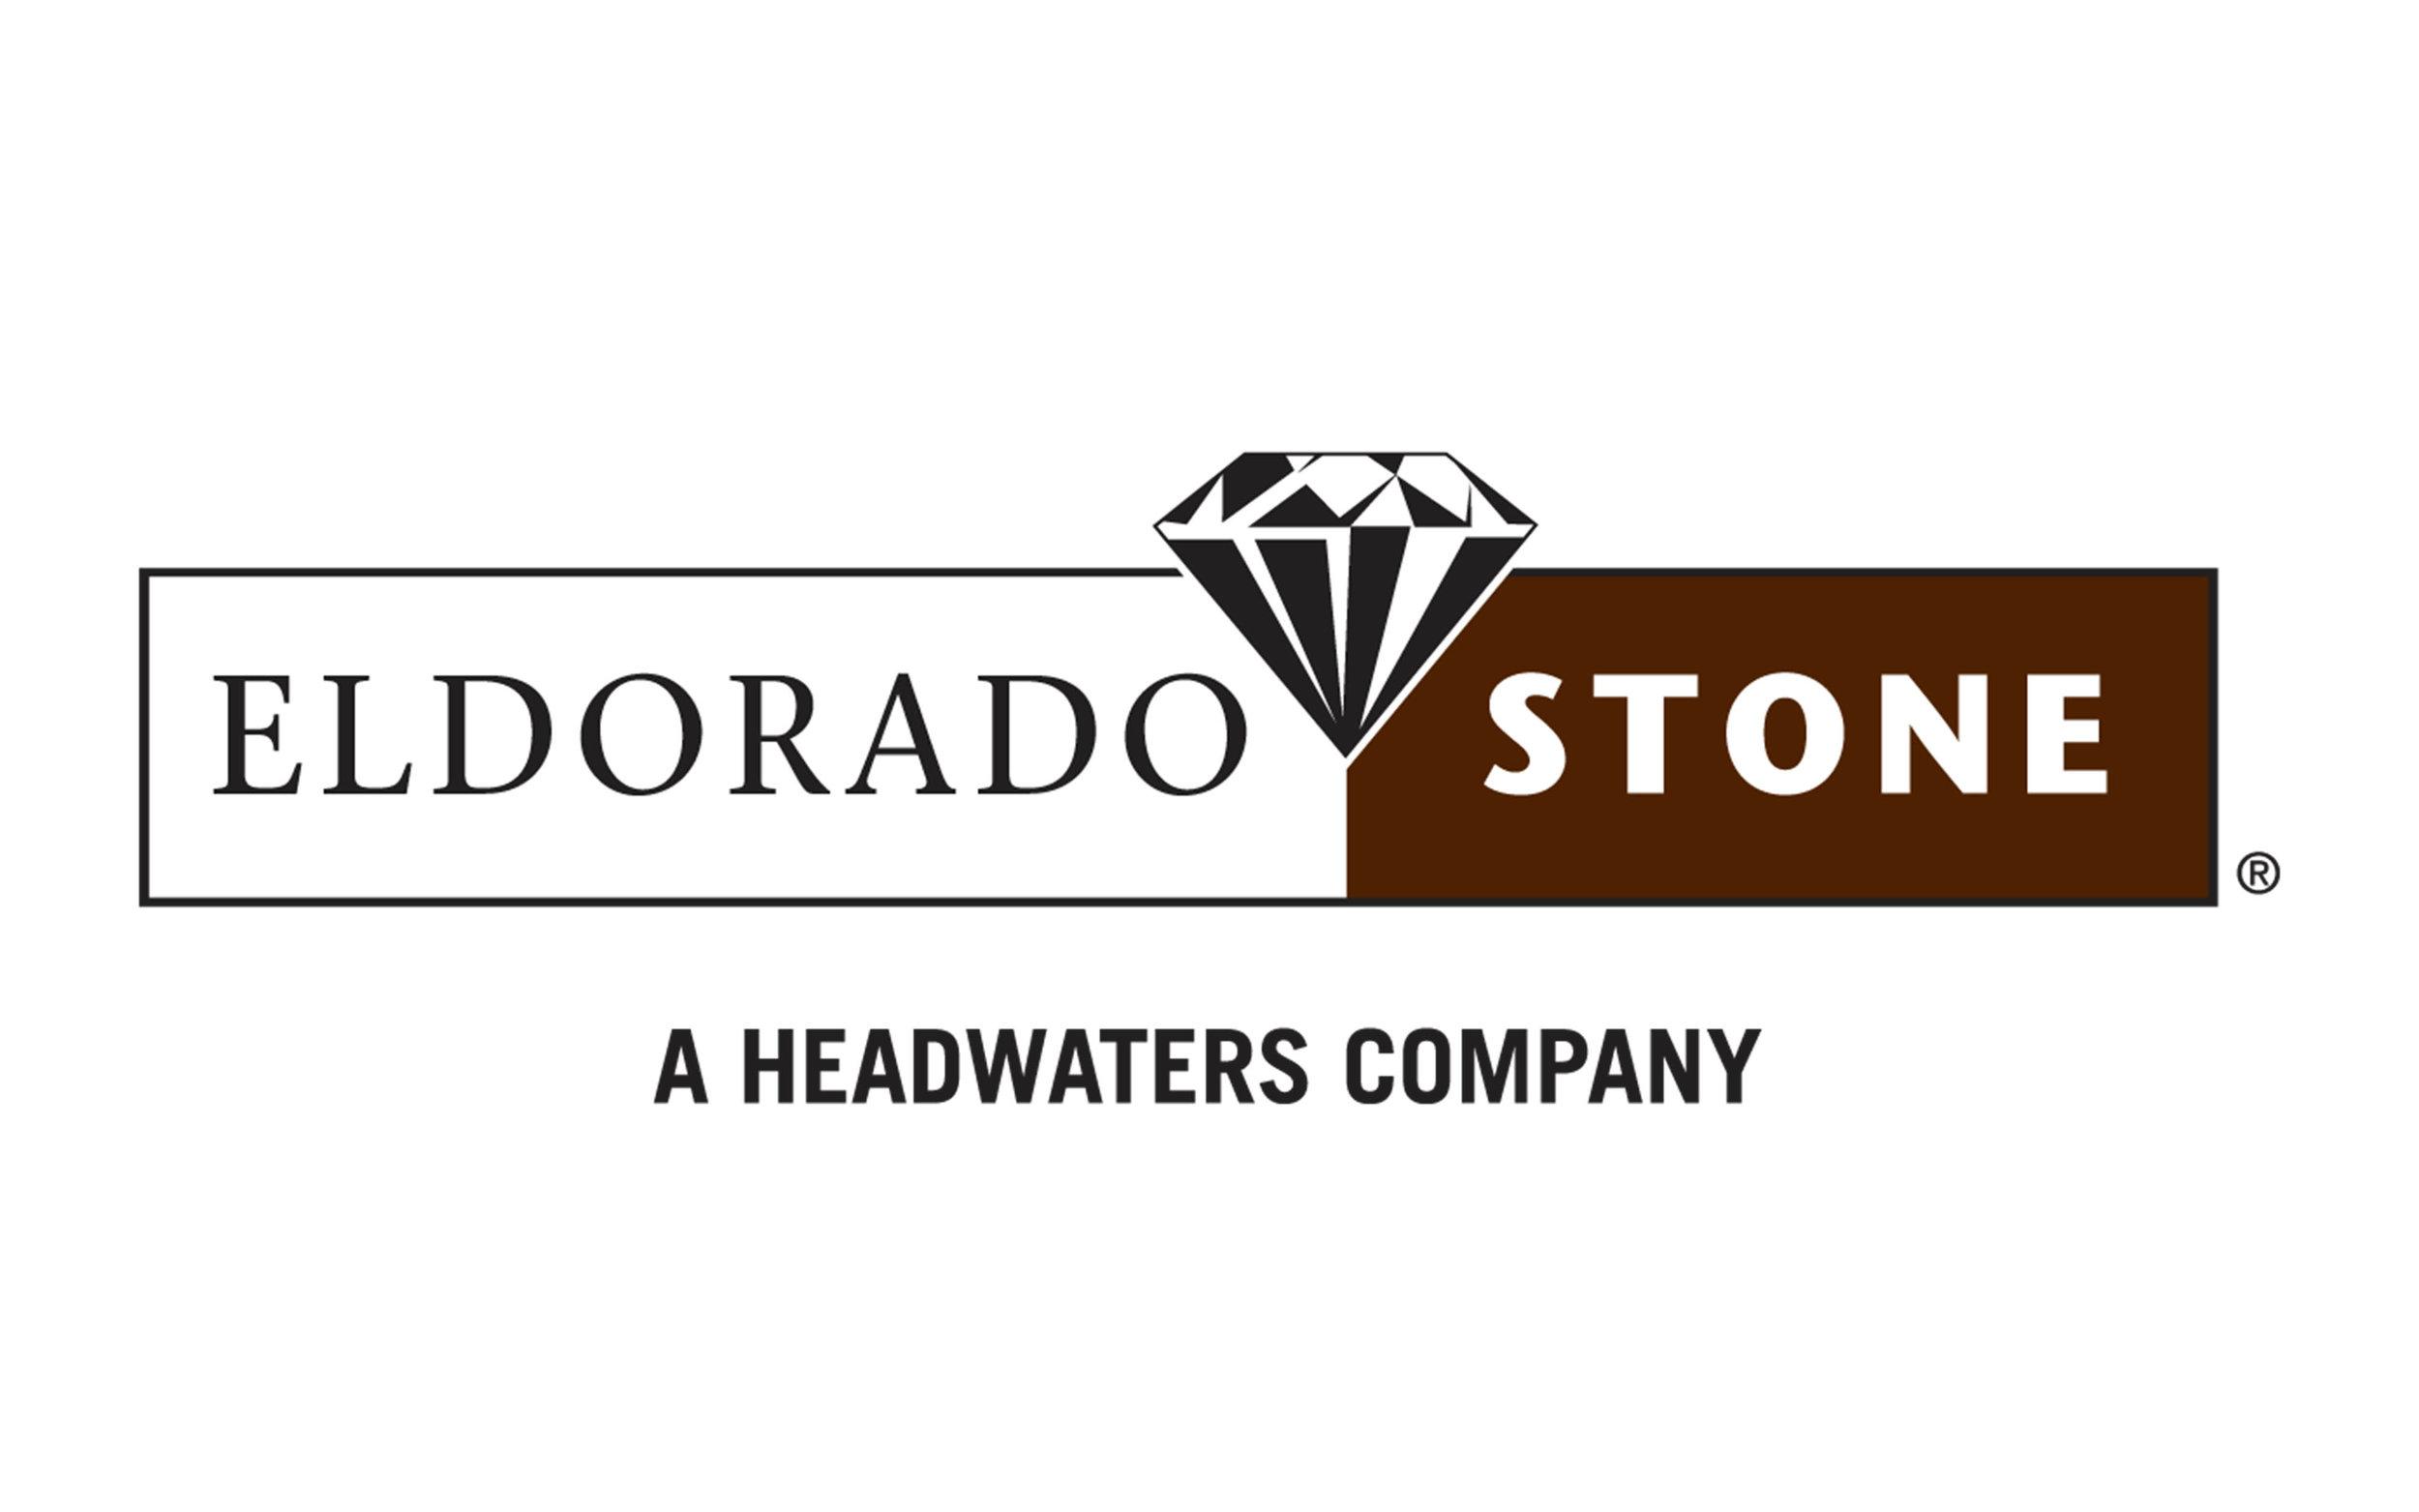 Eldorado Brick - Eldorado Stone has a beautiful line of thin brick that can transform your space! View their profiles below.